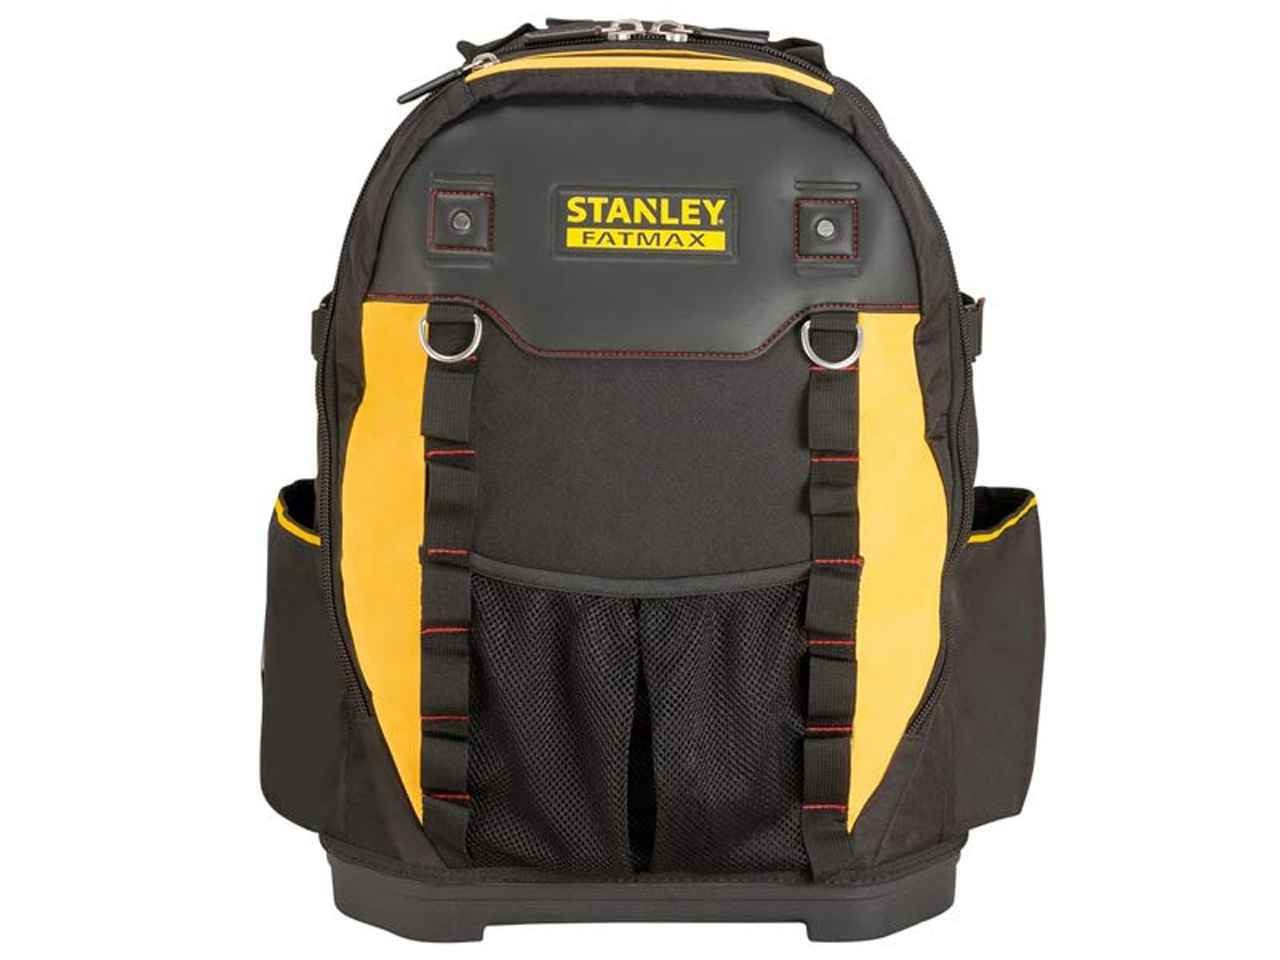 Stanley Sta195611 Fatmax Tool Technicians Ruck Sack Backpack